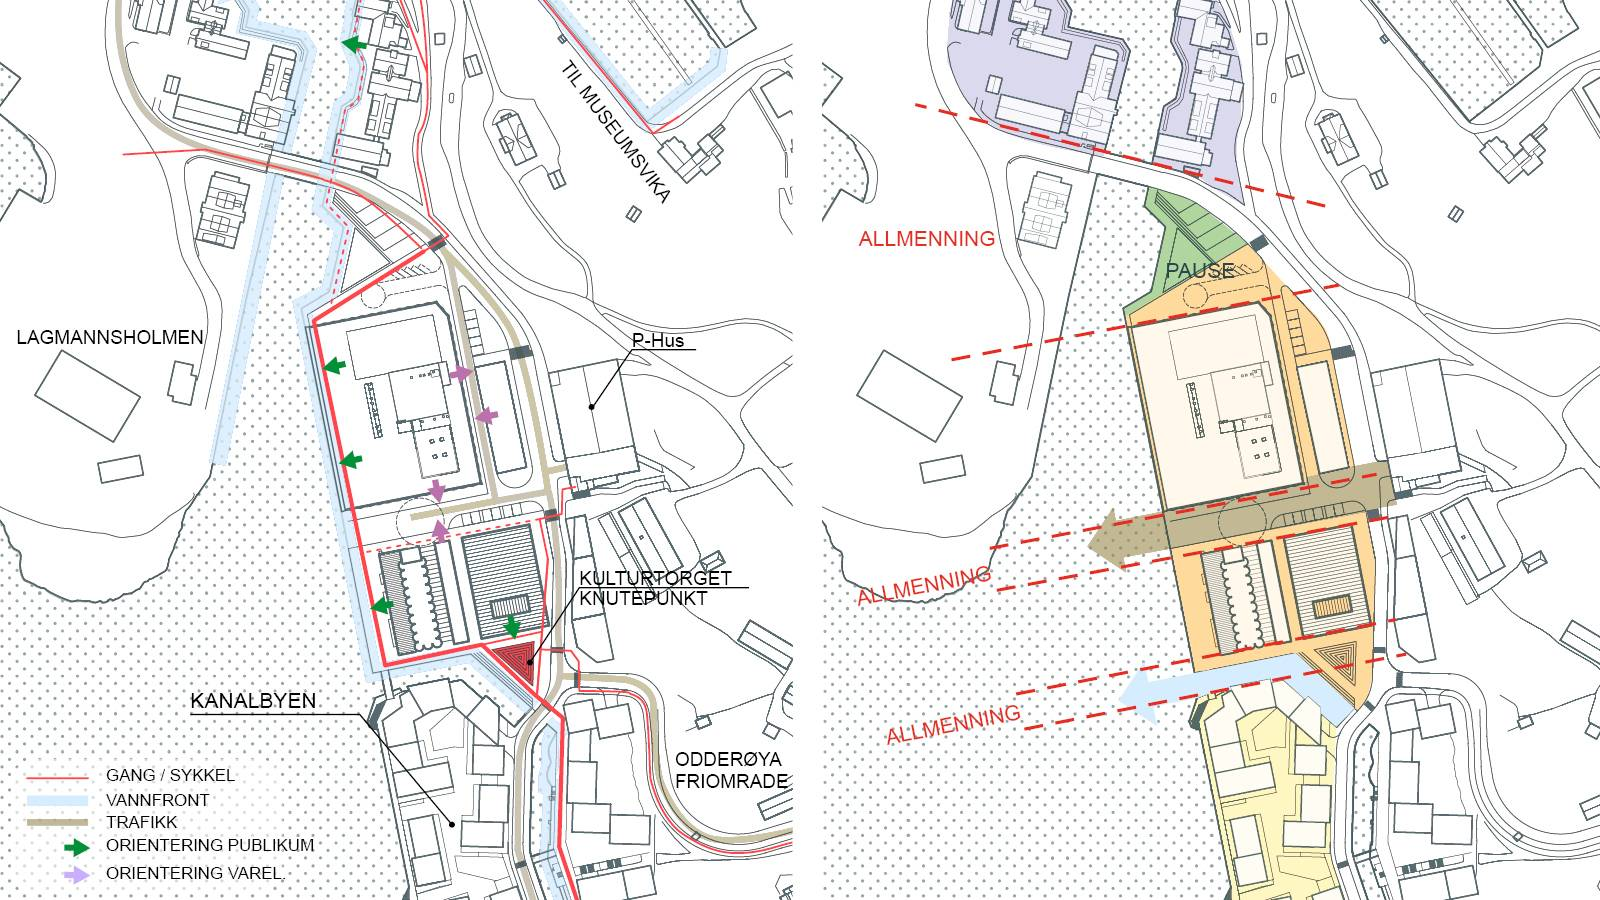 SITE DIAGRAMS - Kunstsilo - SPOL Architects